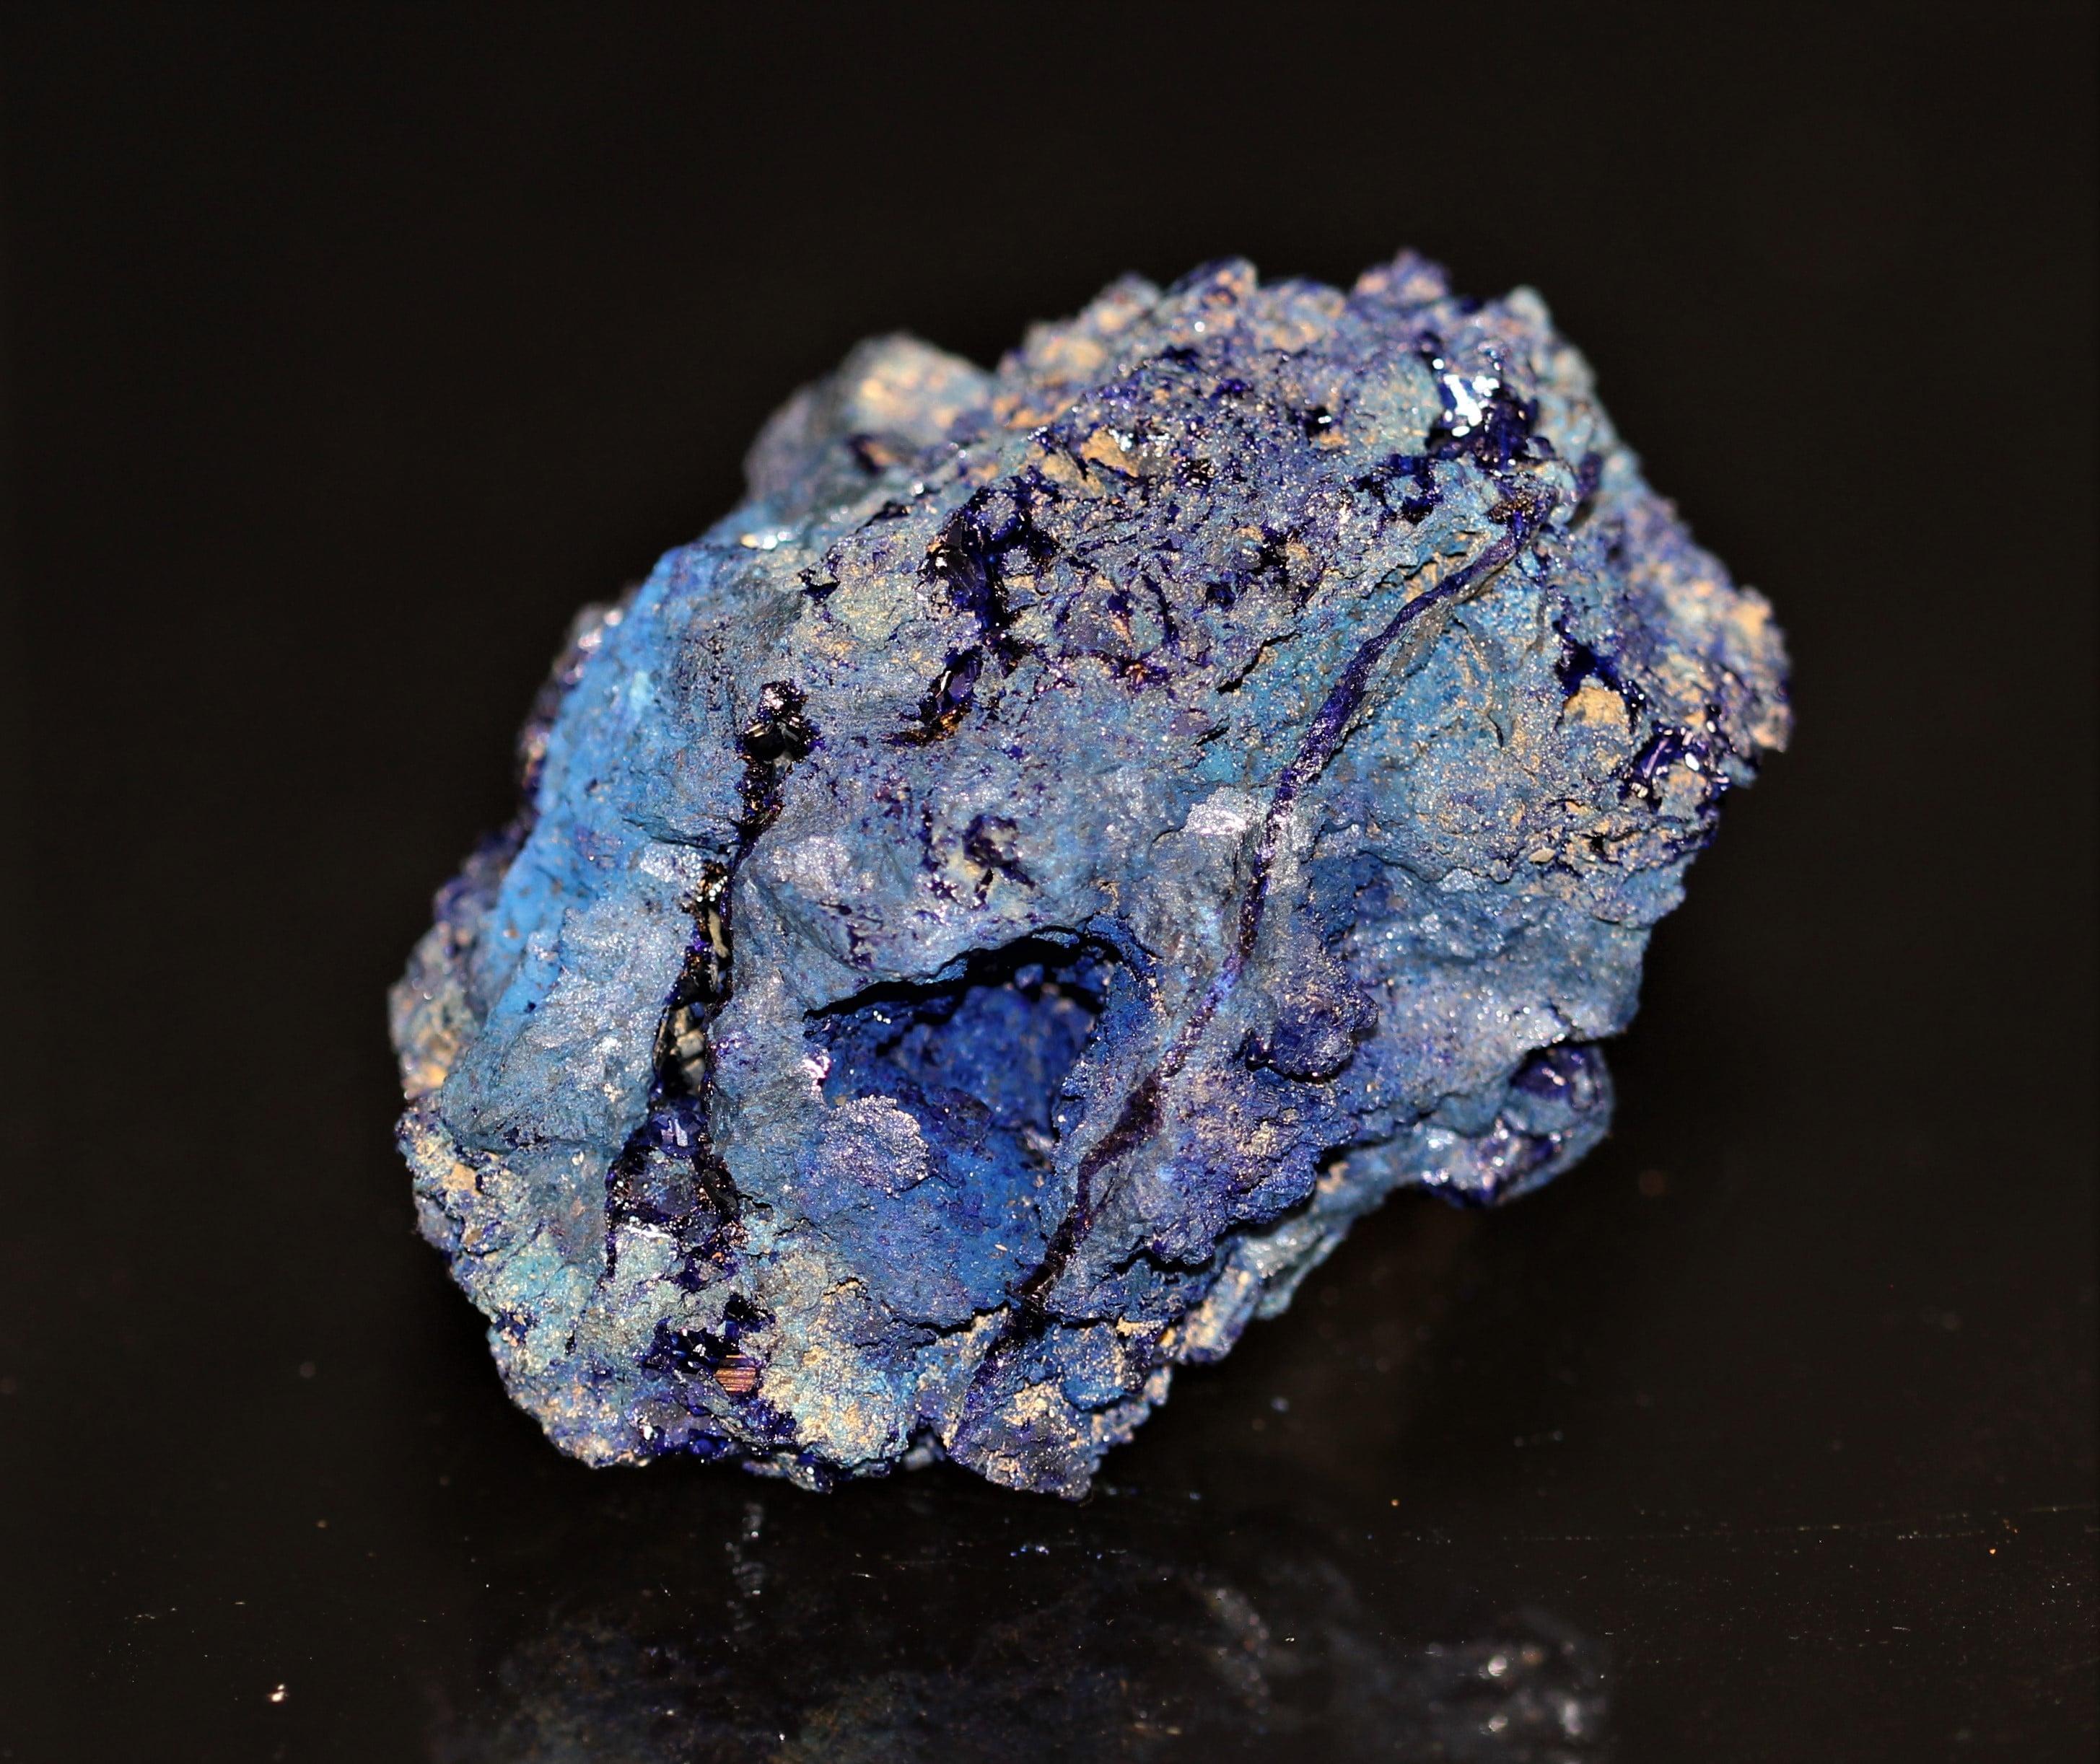 Nodule d'azurite bleu roy, mine de Chessy, Rhône-Alpes.